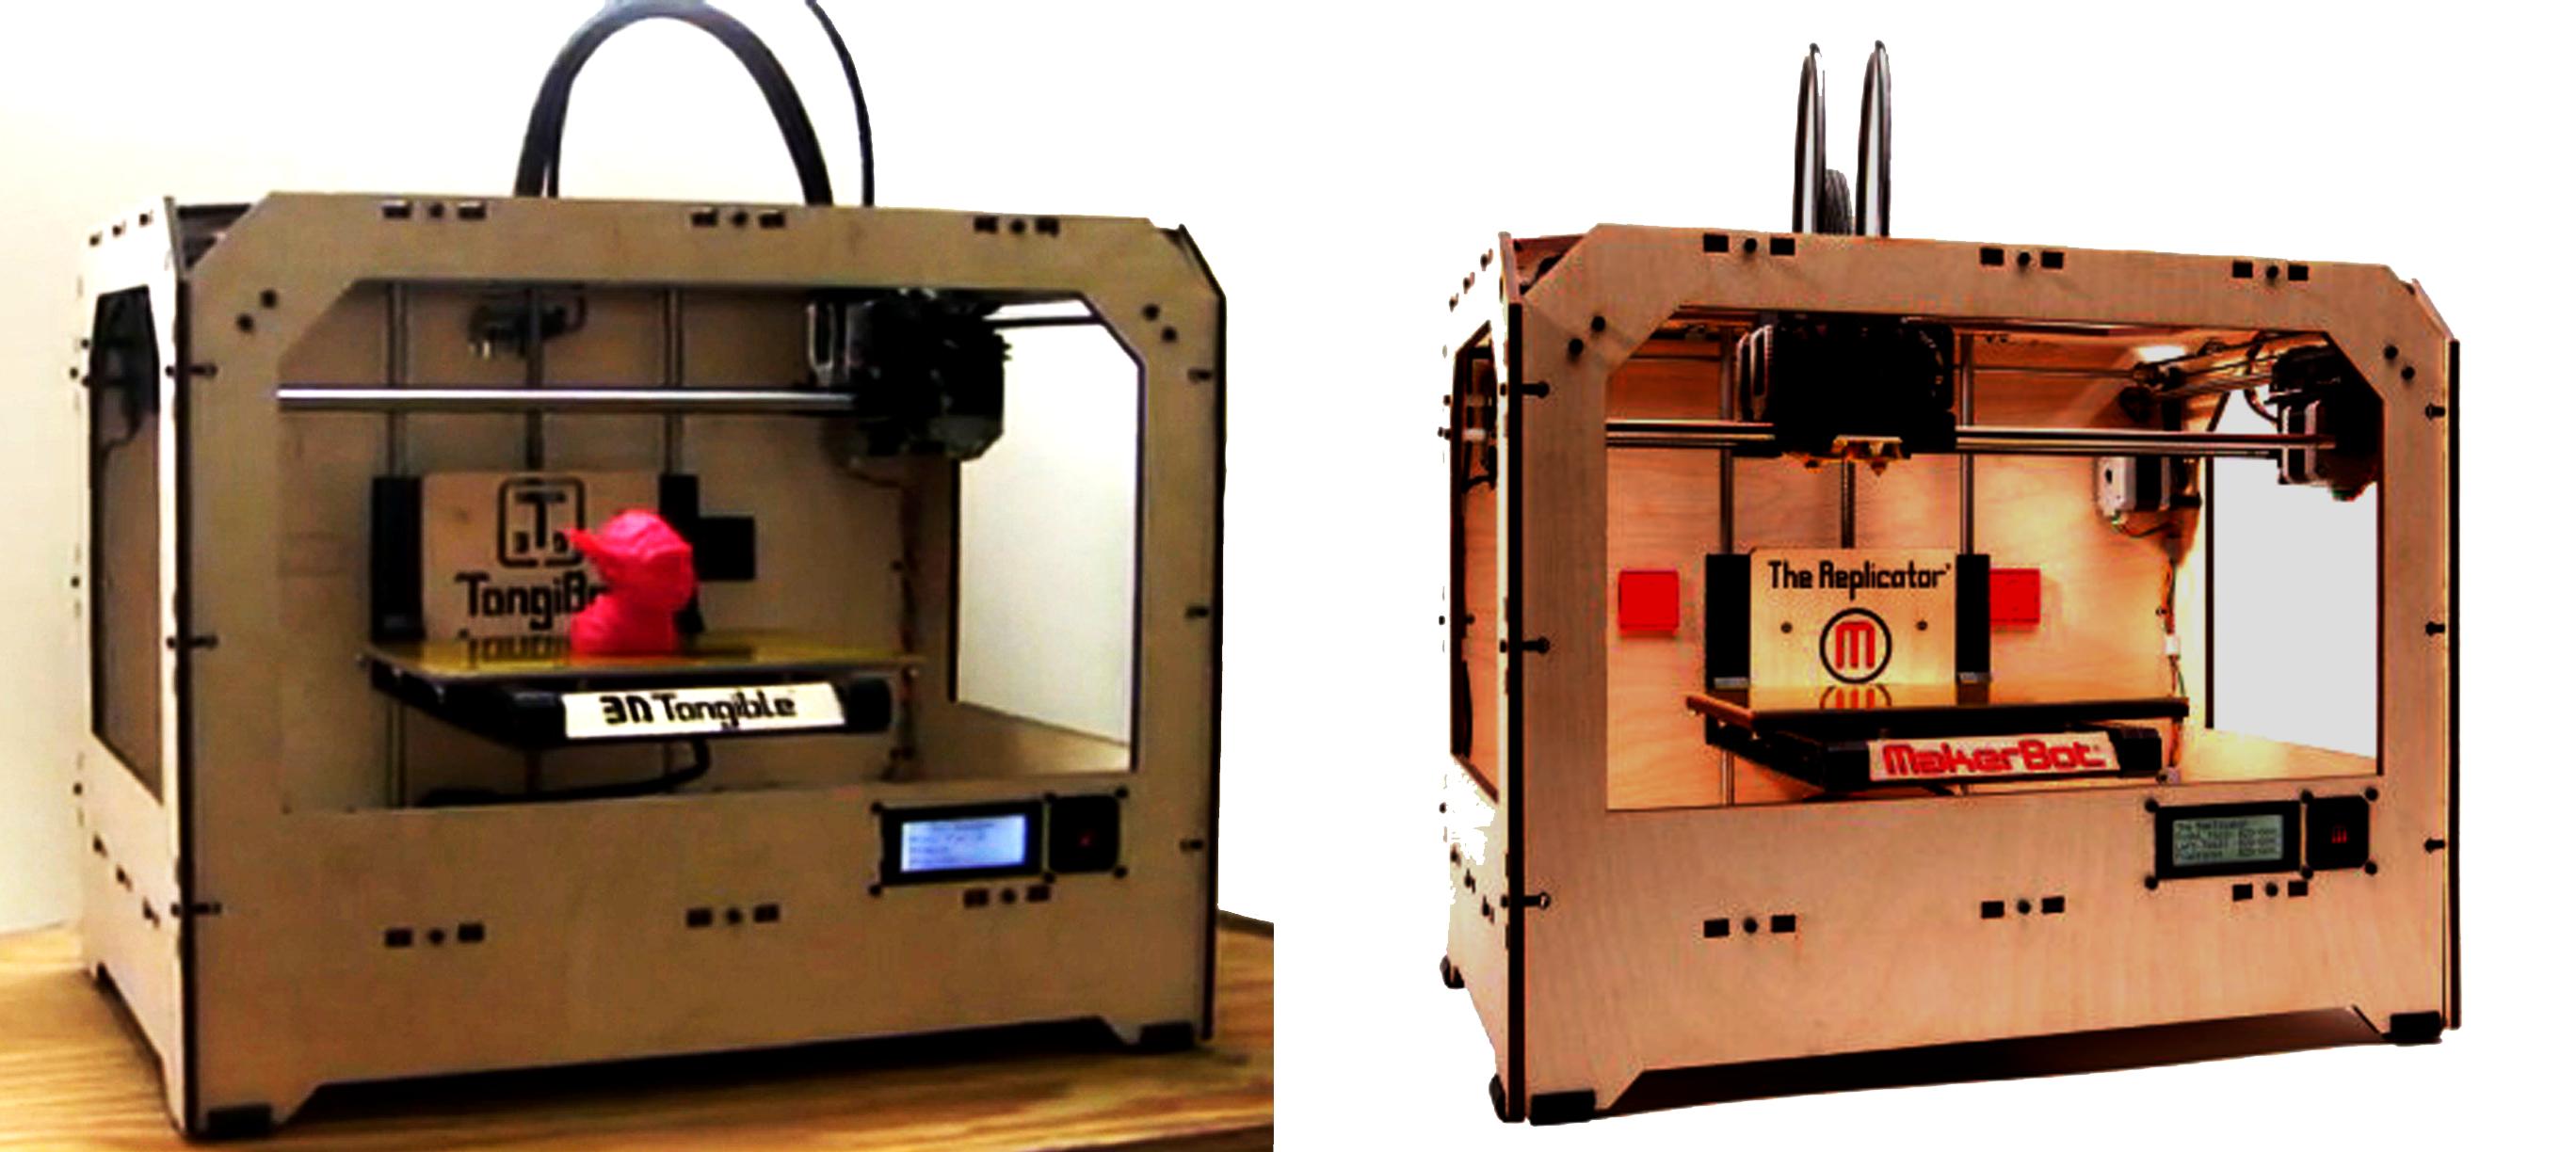 3dpi tangibot makerbot 3d printers side by side